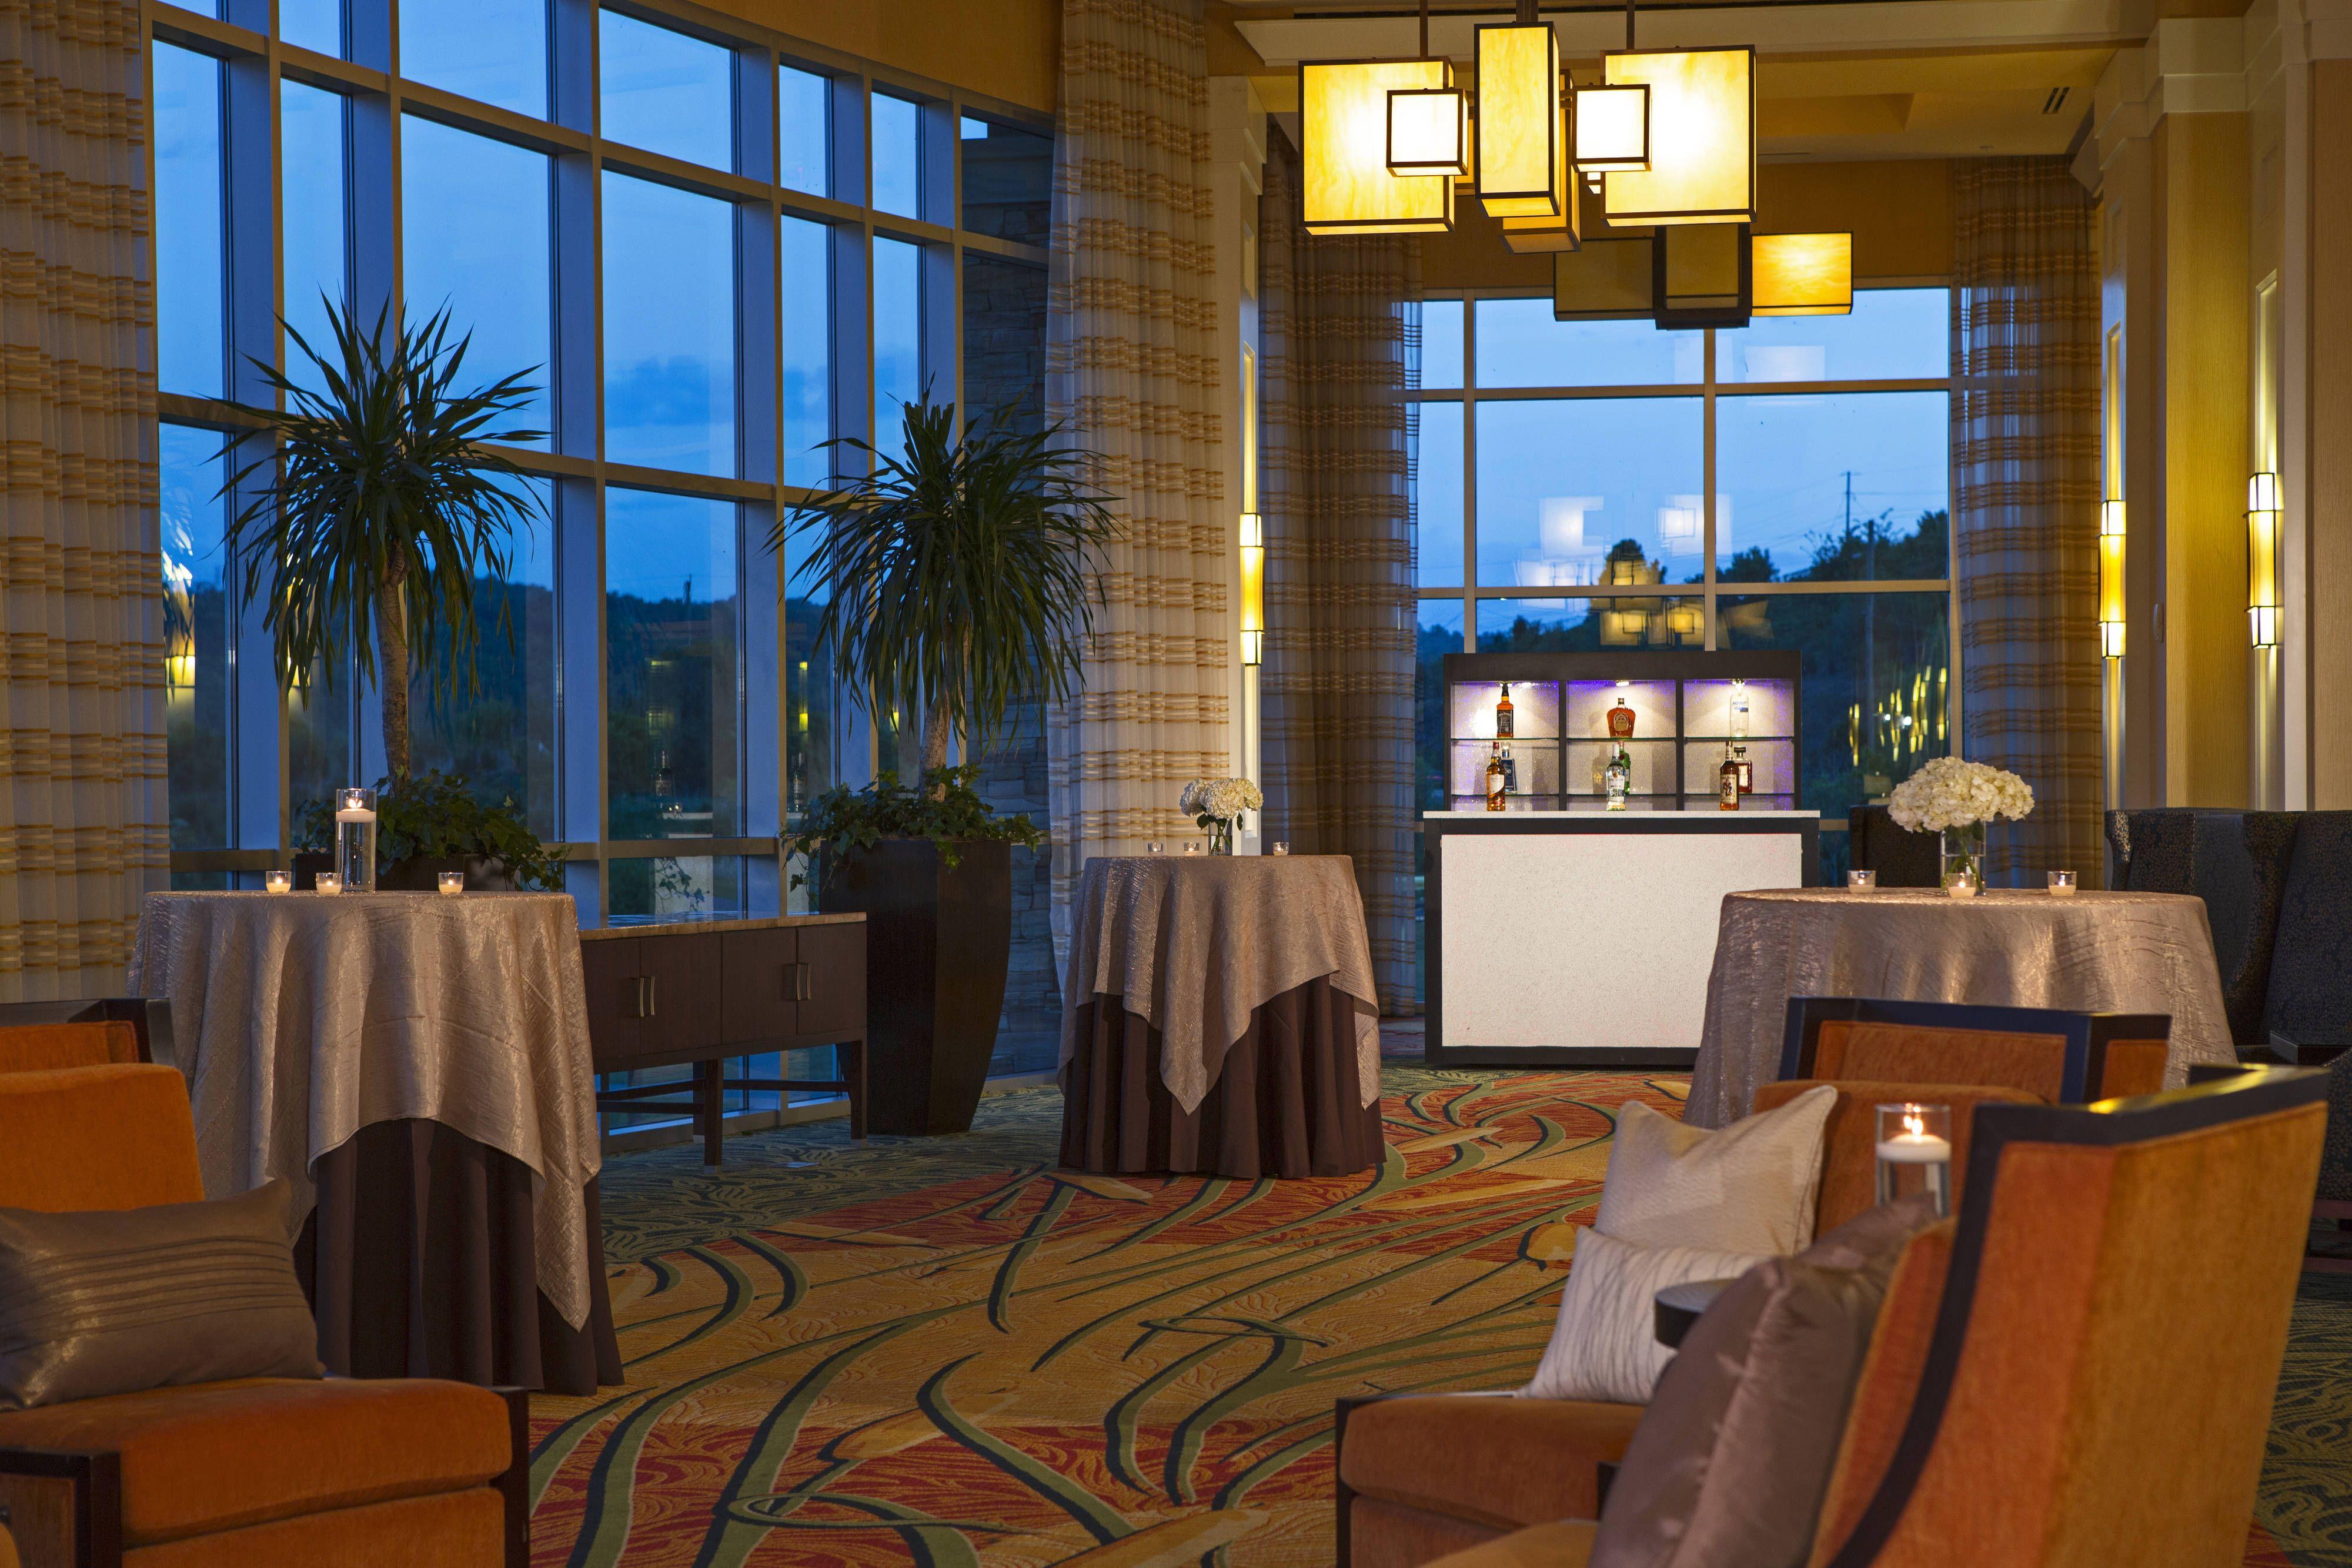 Pin On My Love Hotel